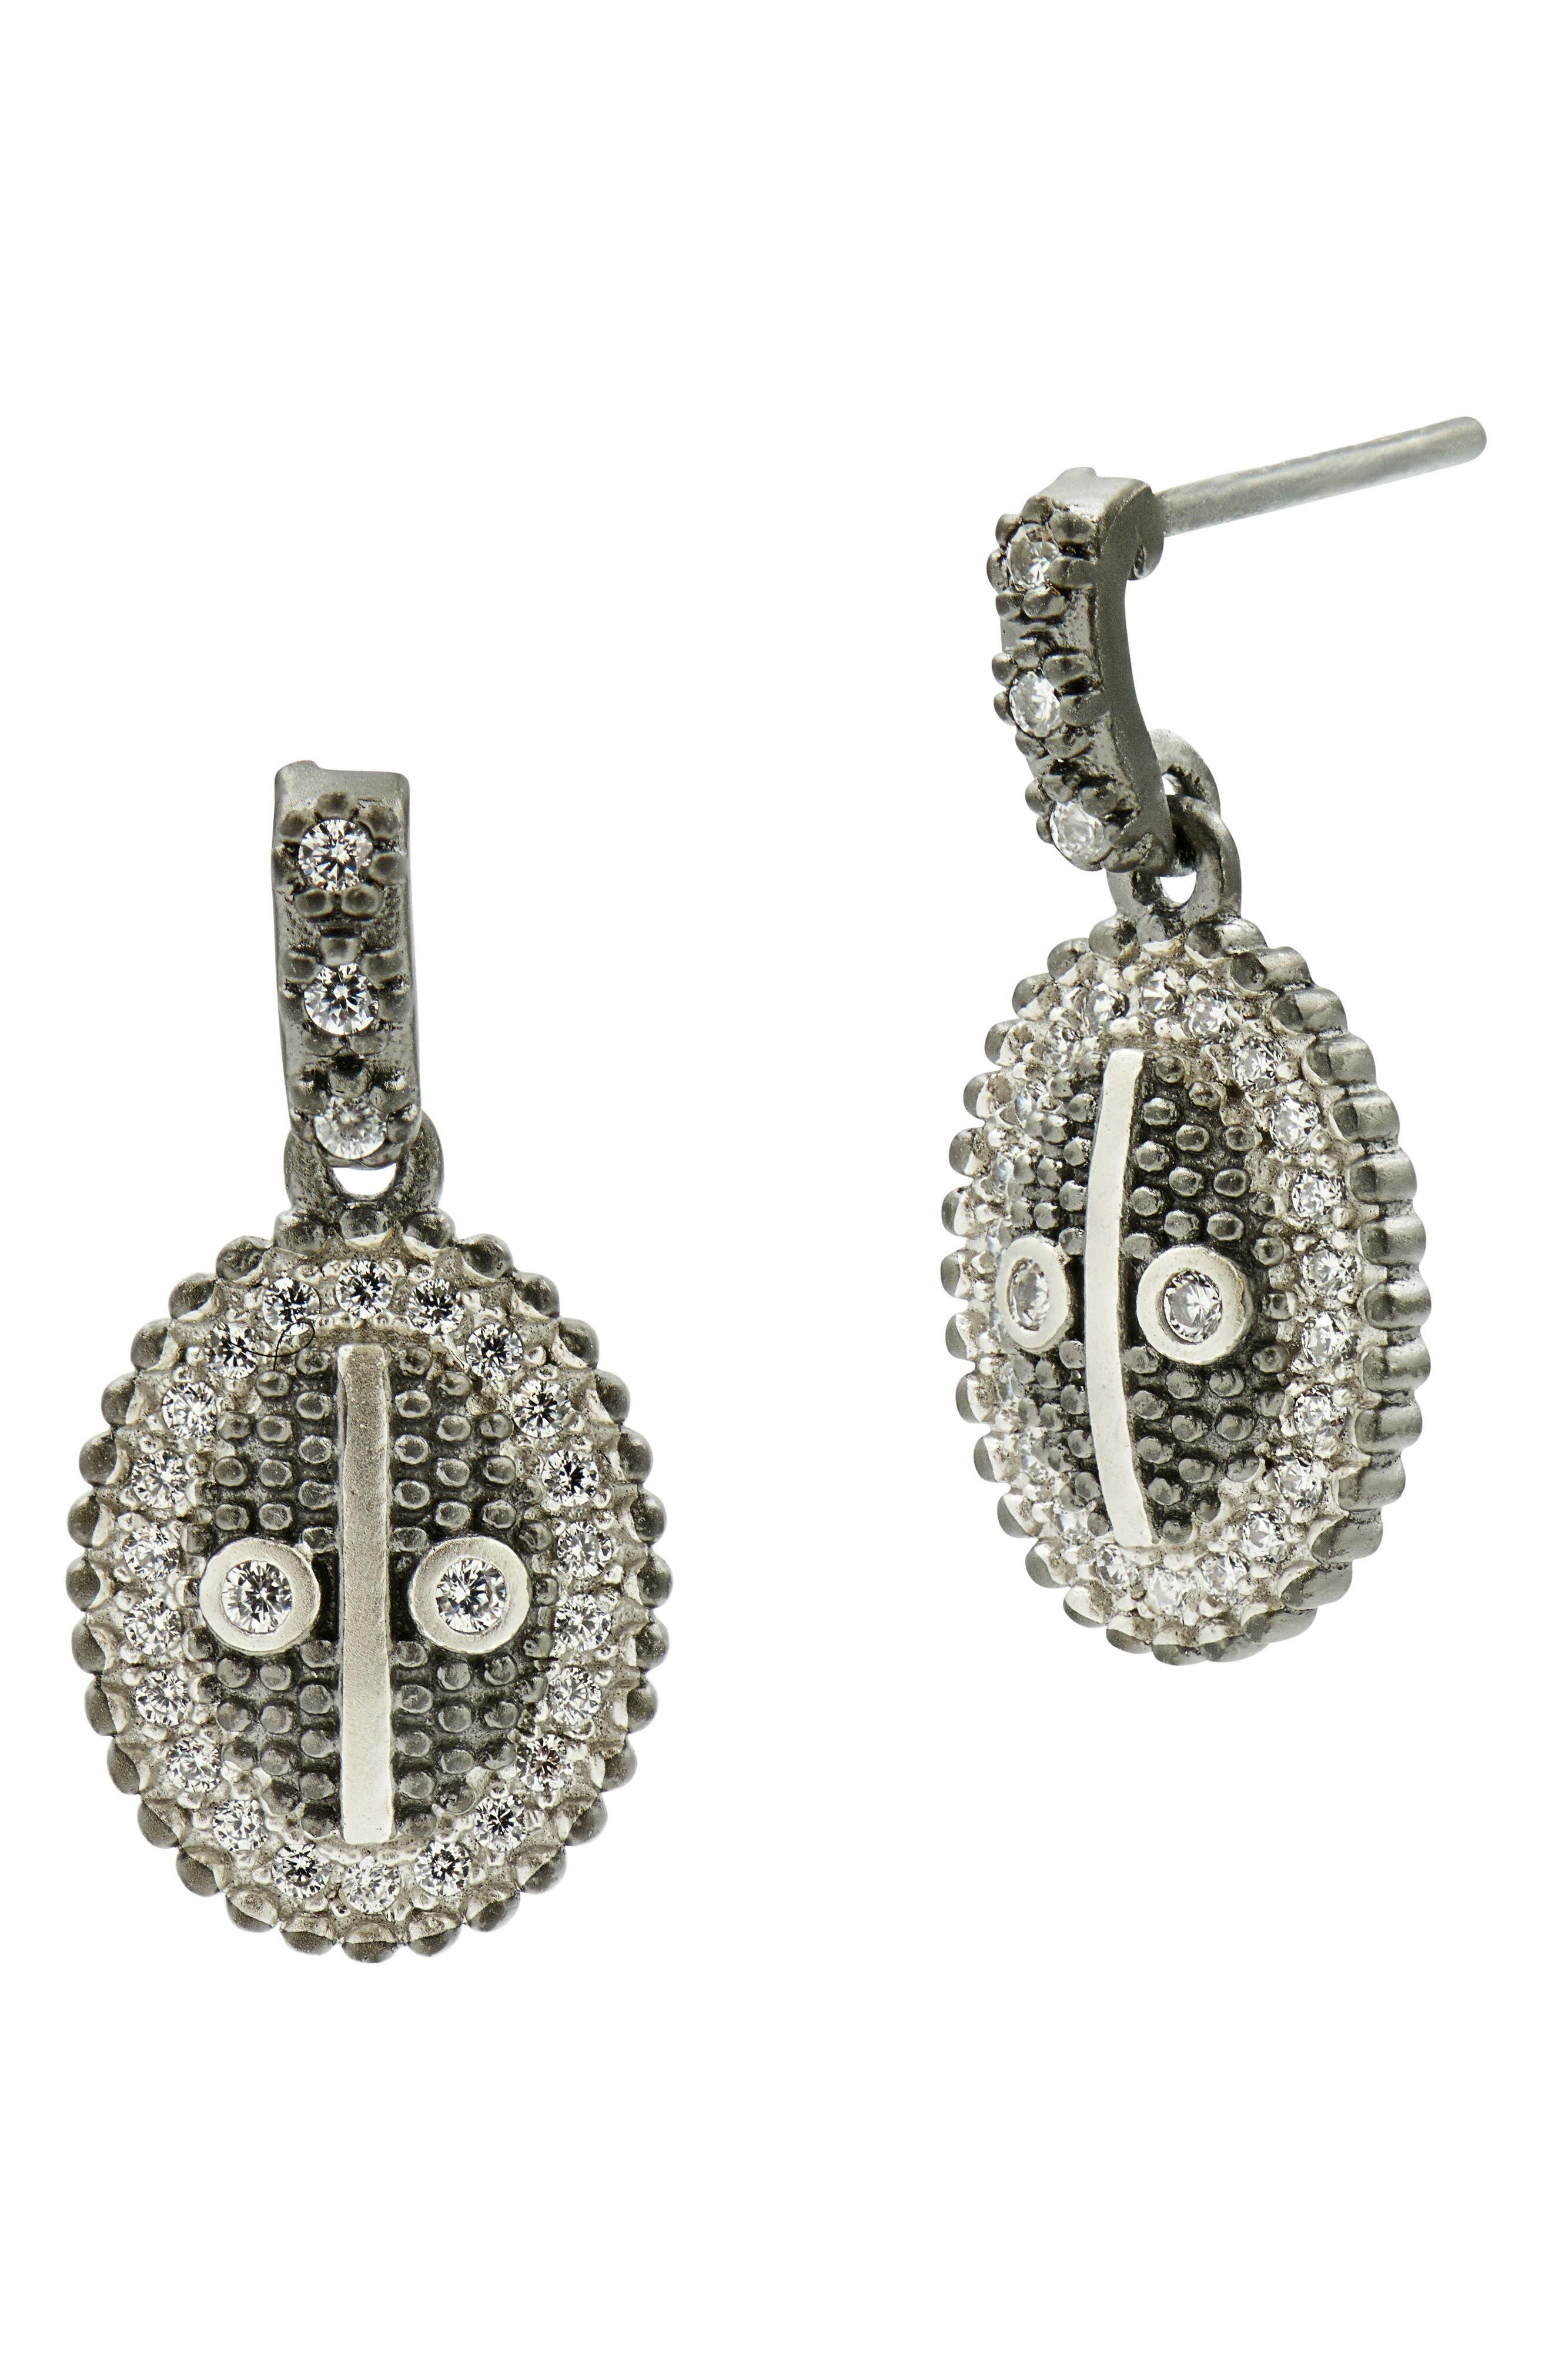 Main Image - FREIDA ROTHMAN Industrial Finish Oval Drop Earrings